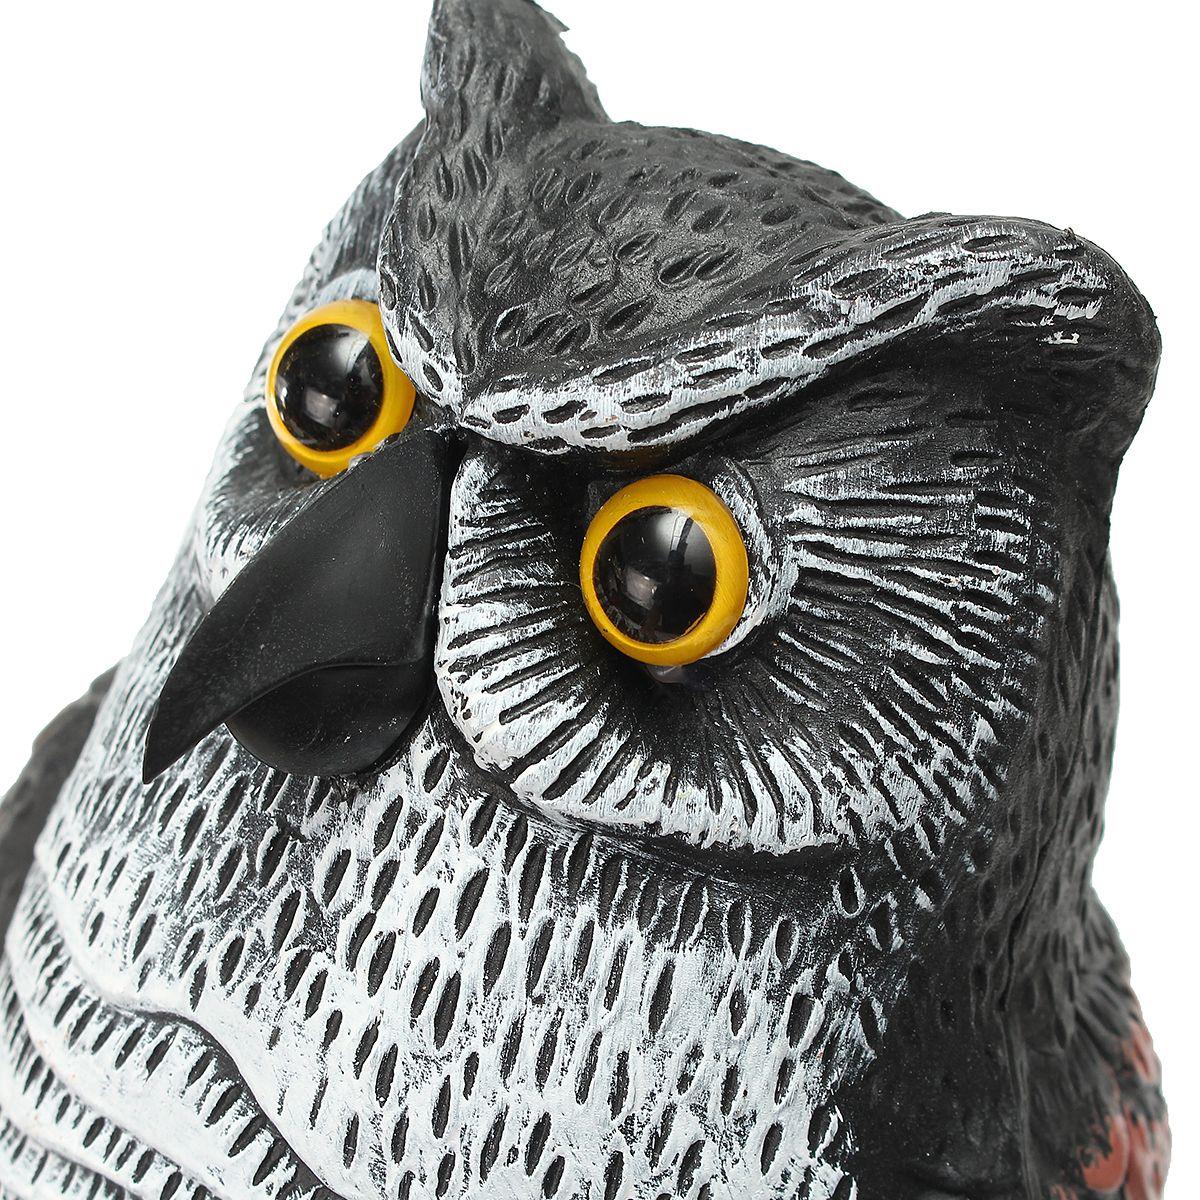 Rotating Head Fake Owl Scarecrow Hunting Decoy Bird Scare